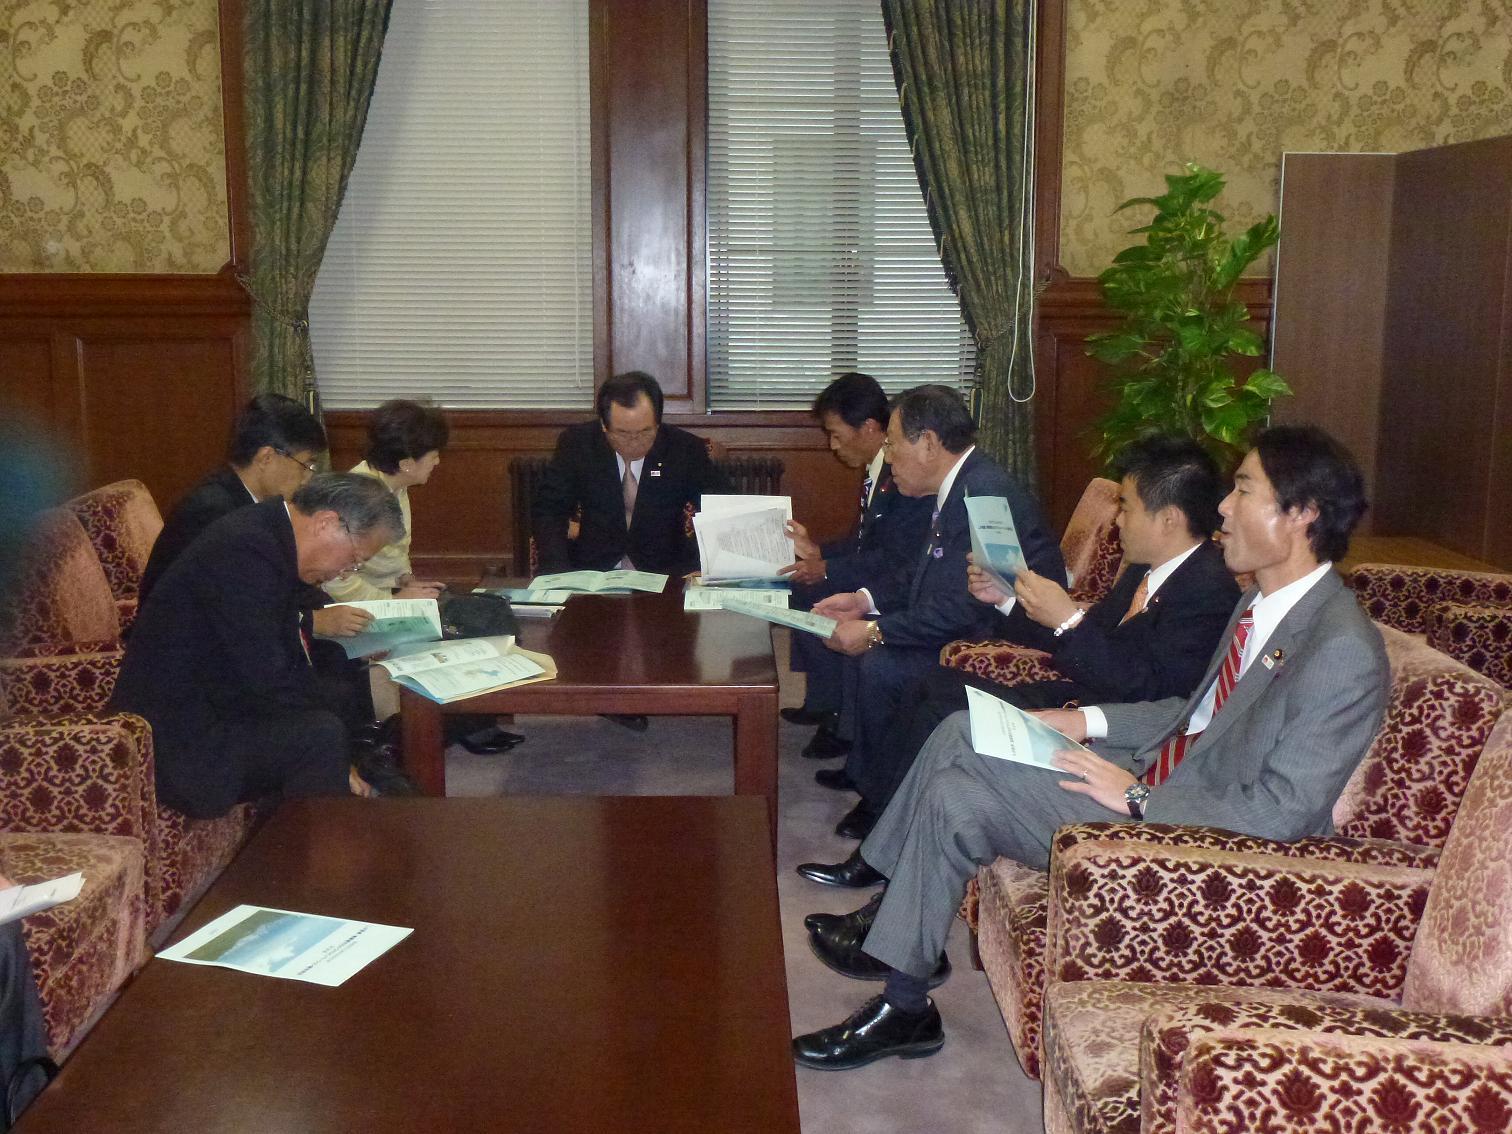 滋賀県政策提言を民主党へ要望